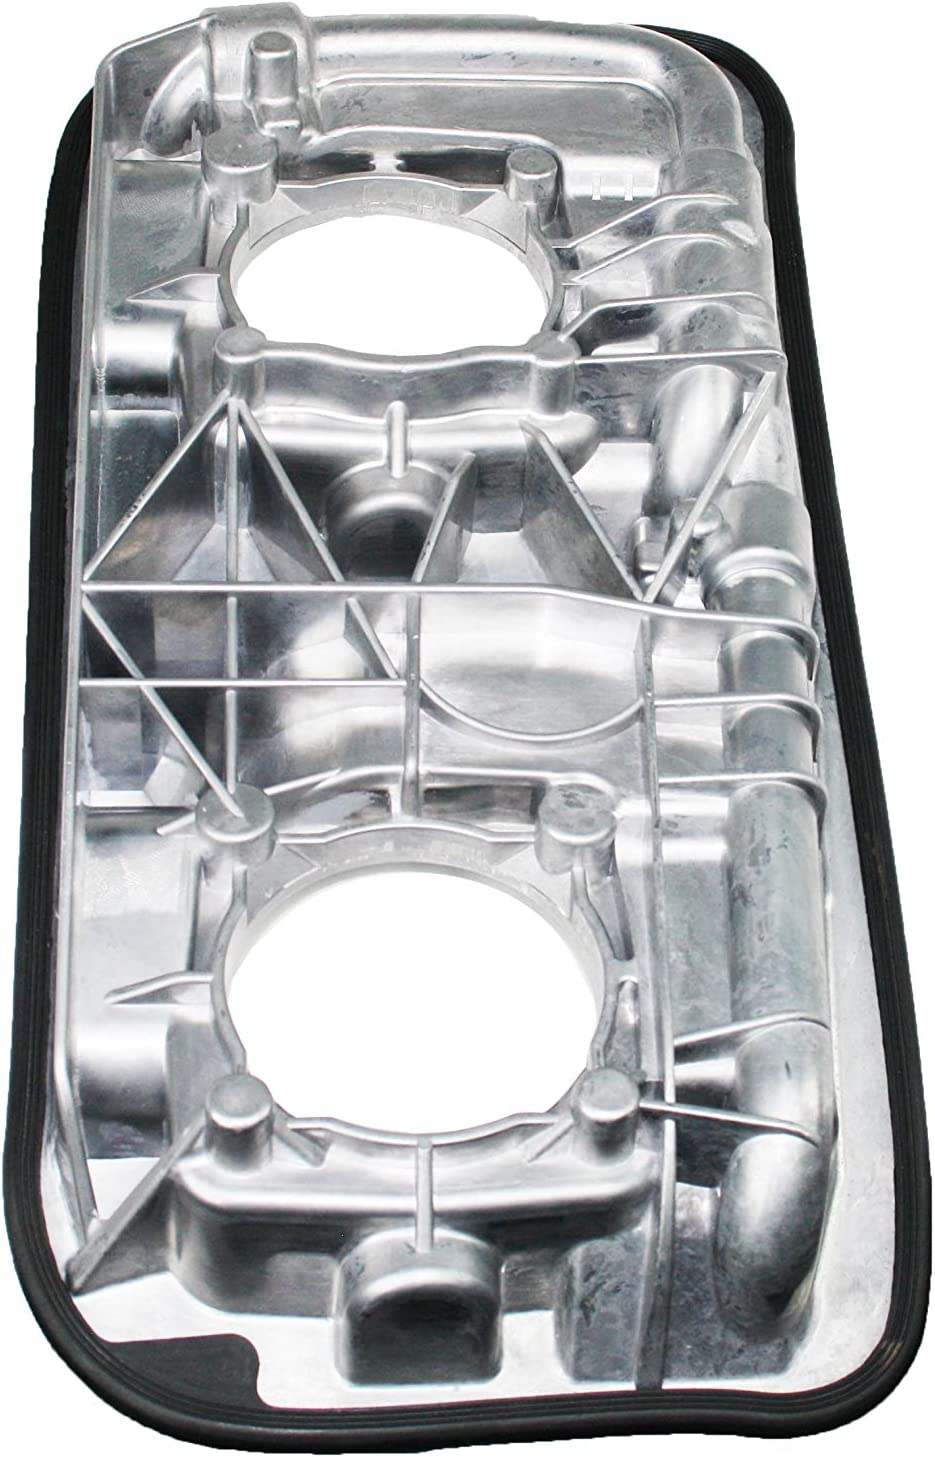 RMT M156-A105-ADFU Mercedes M156 V8 Engine Intake Manifold Throttle Body Plate /& Gasket Set